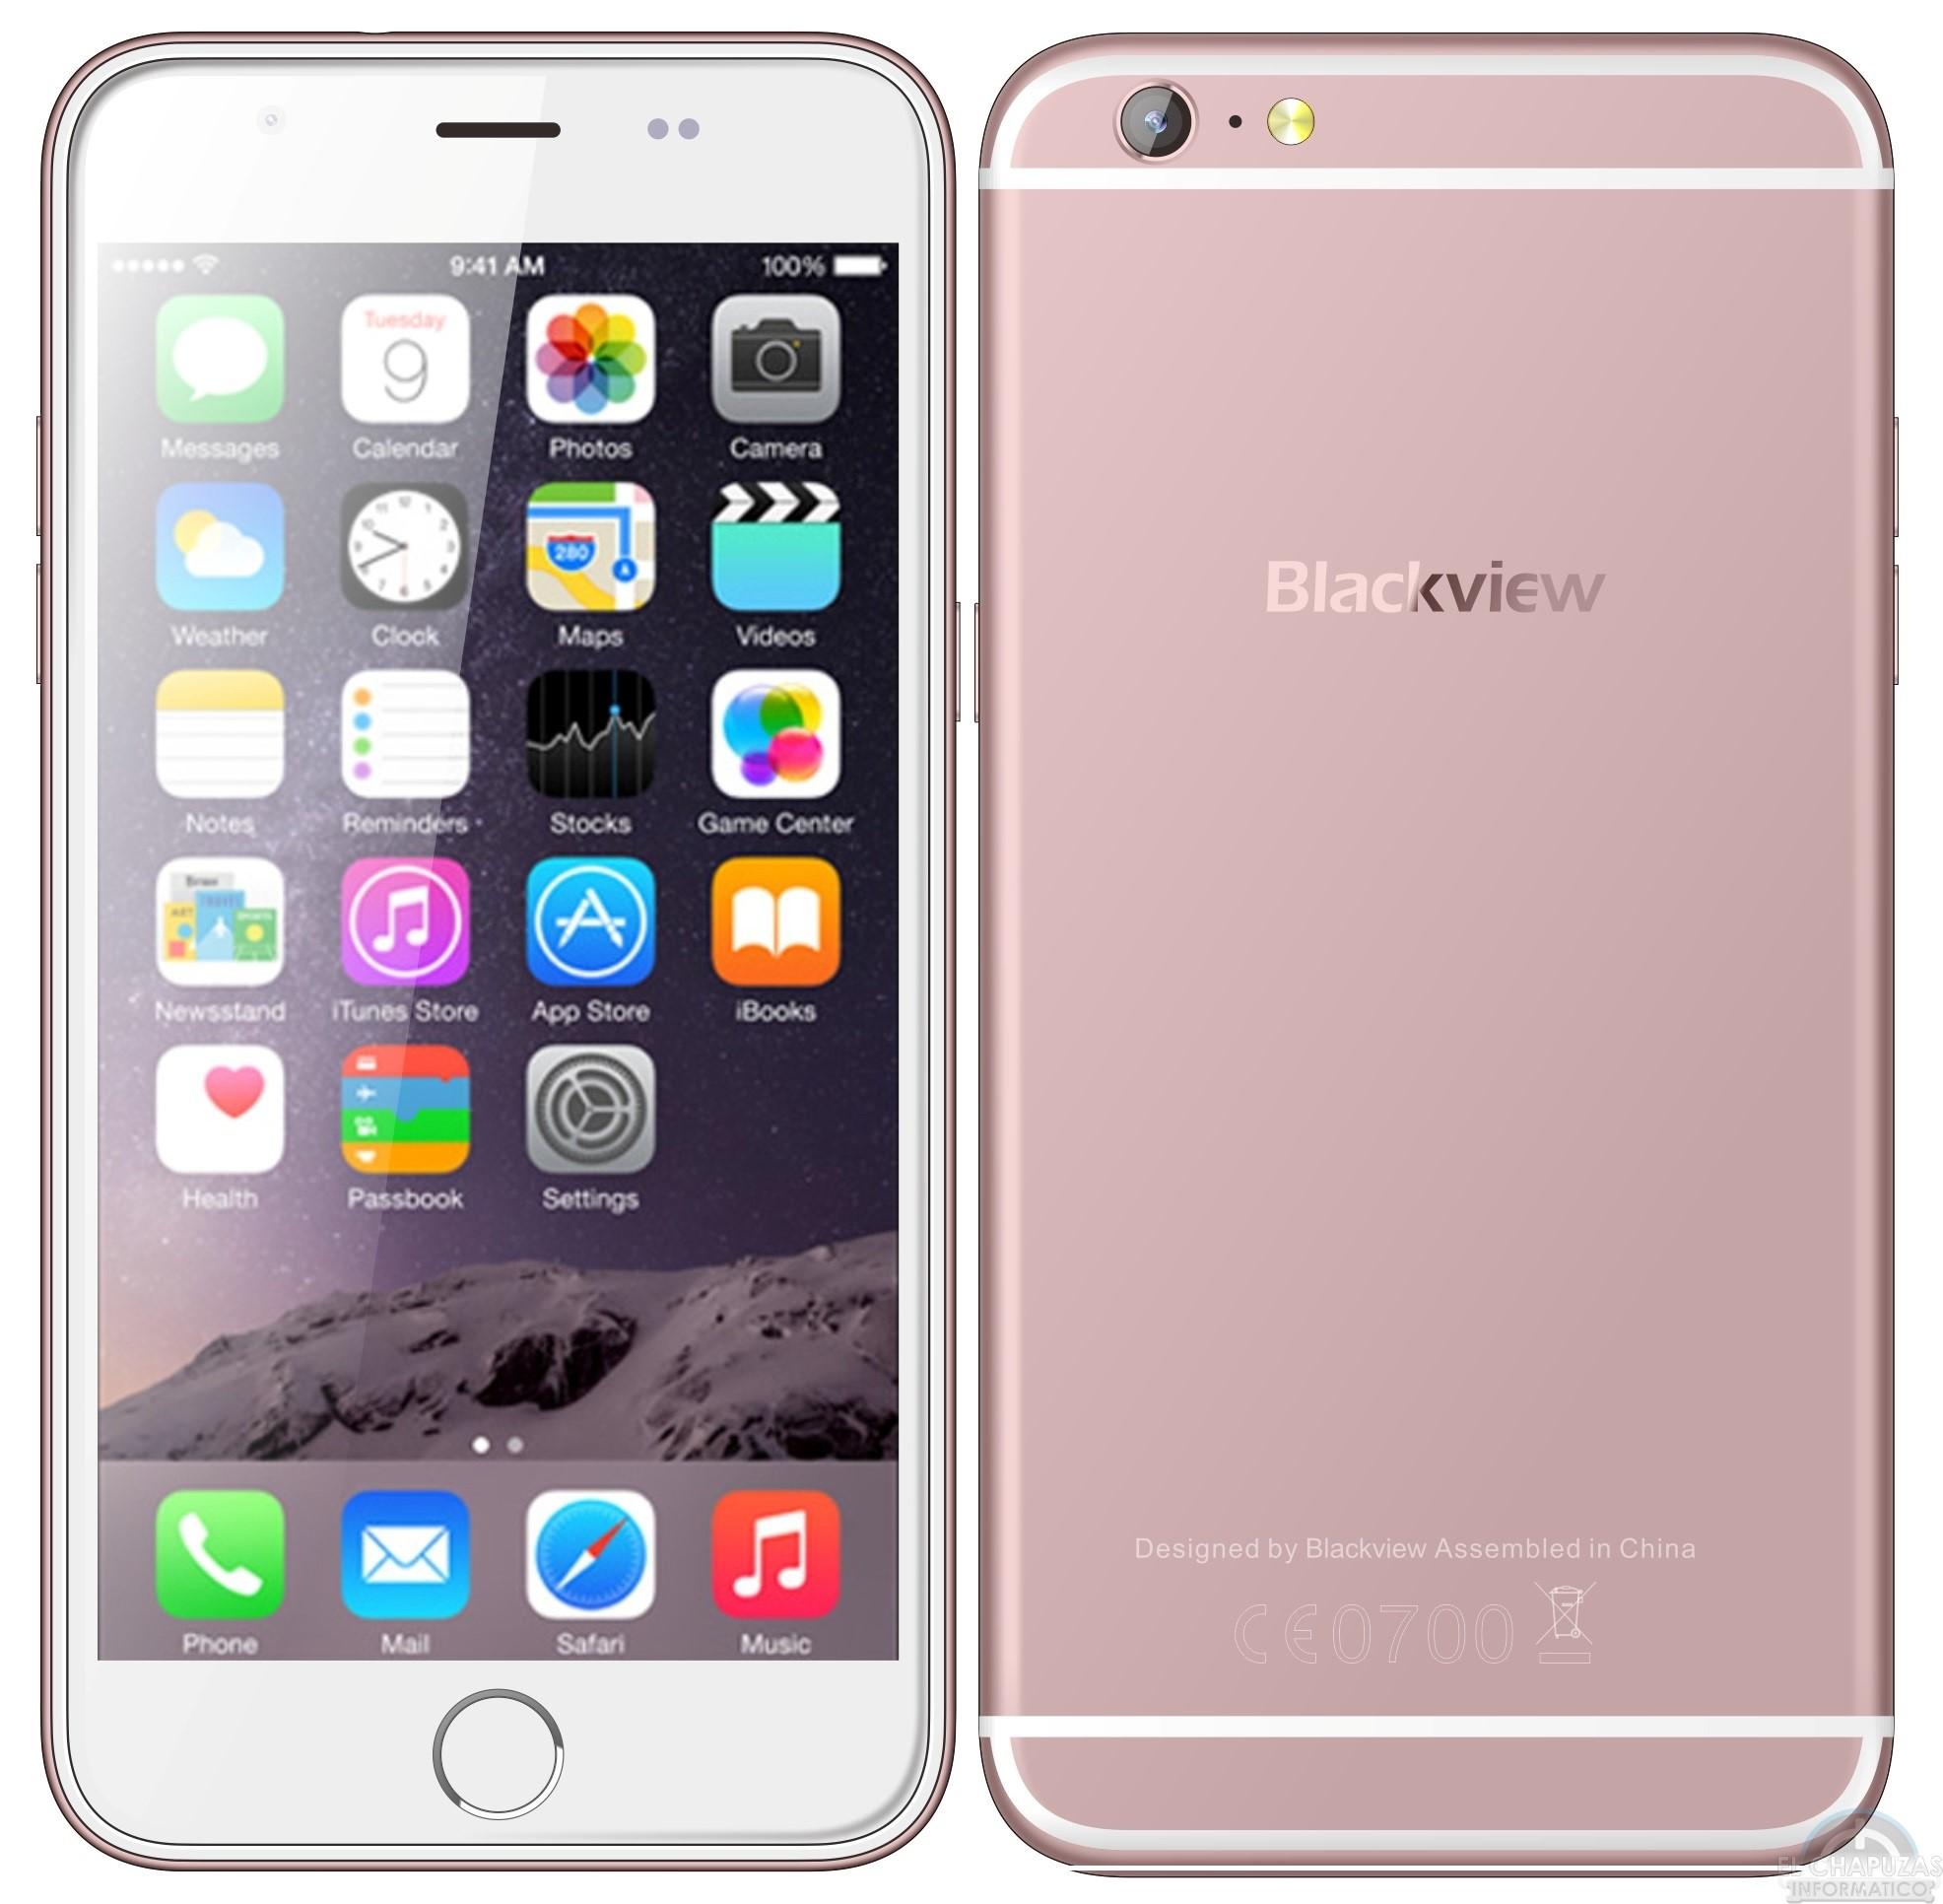 Blackview Ultra Plus Clon Del Iphone 6s Plus El